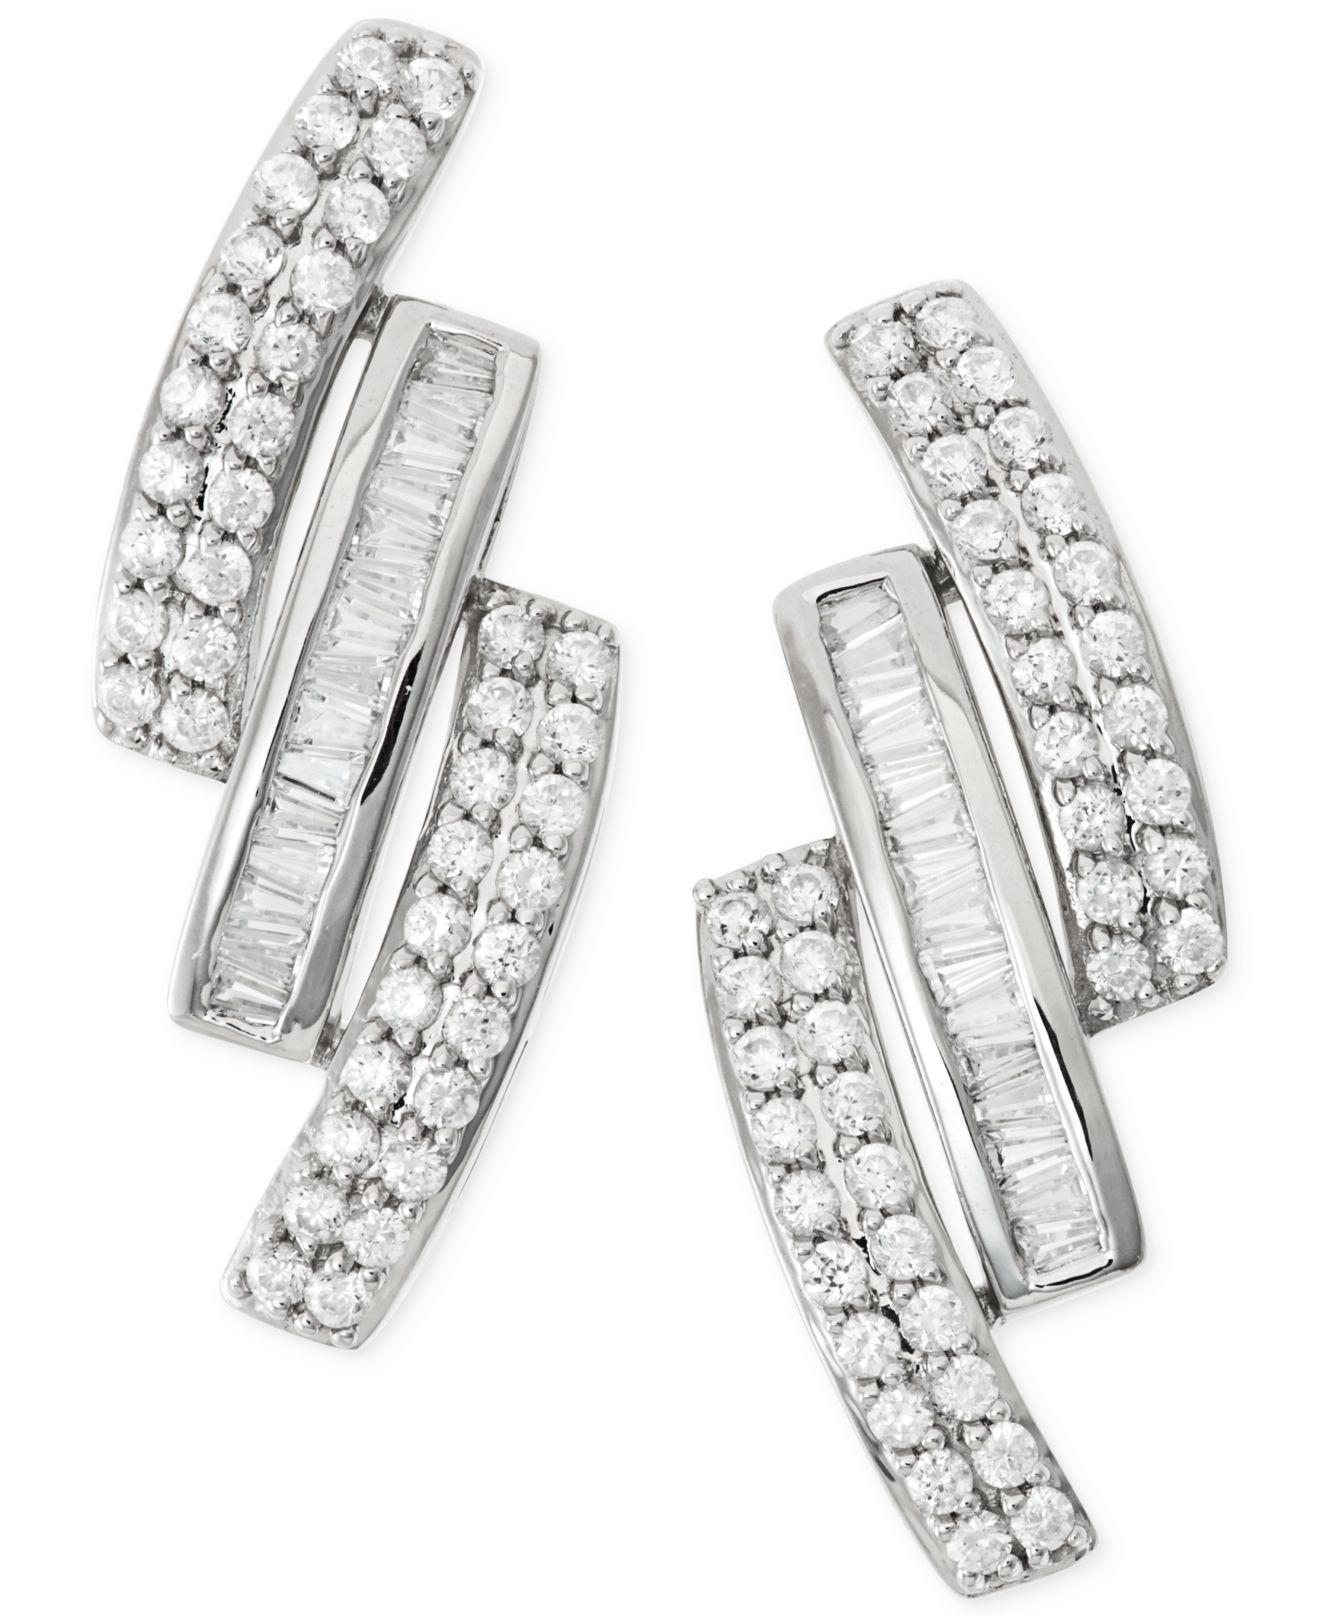 Wrapped In Love Diamond Three Row Earrings 1 Ct T W In 14k White Gold In Metallic Lyst